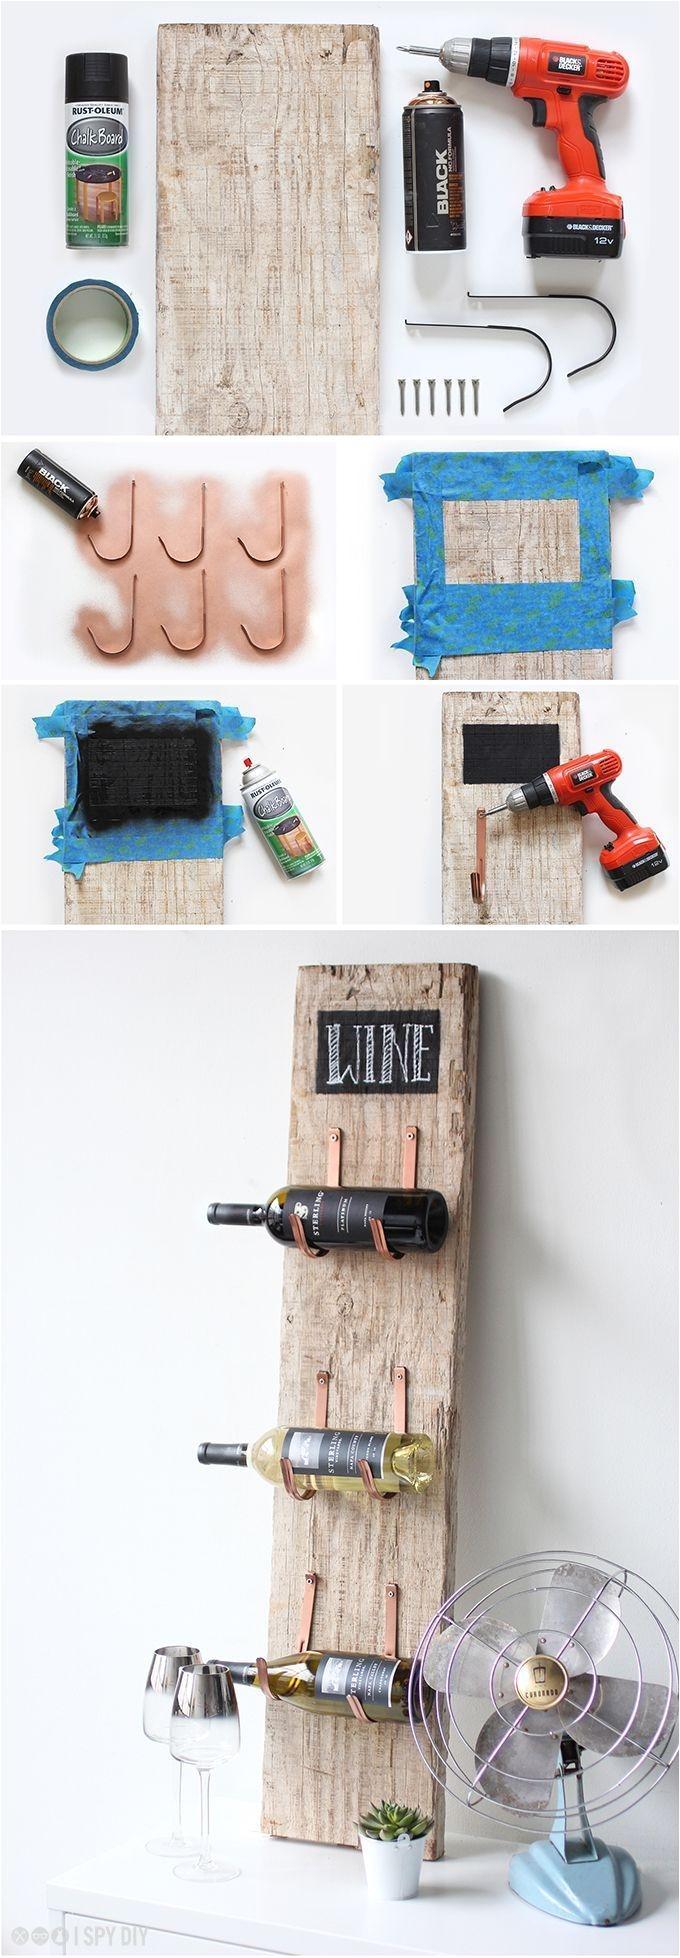 Sterline Electric Tie Rack 189 Best Diy Homedecor Images On Pinterest Easy Diy Make Jewelry